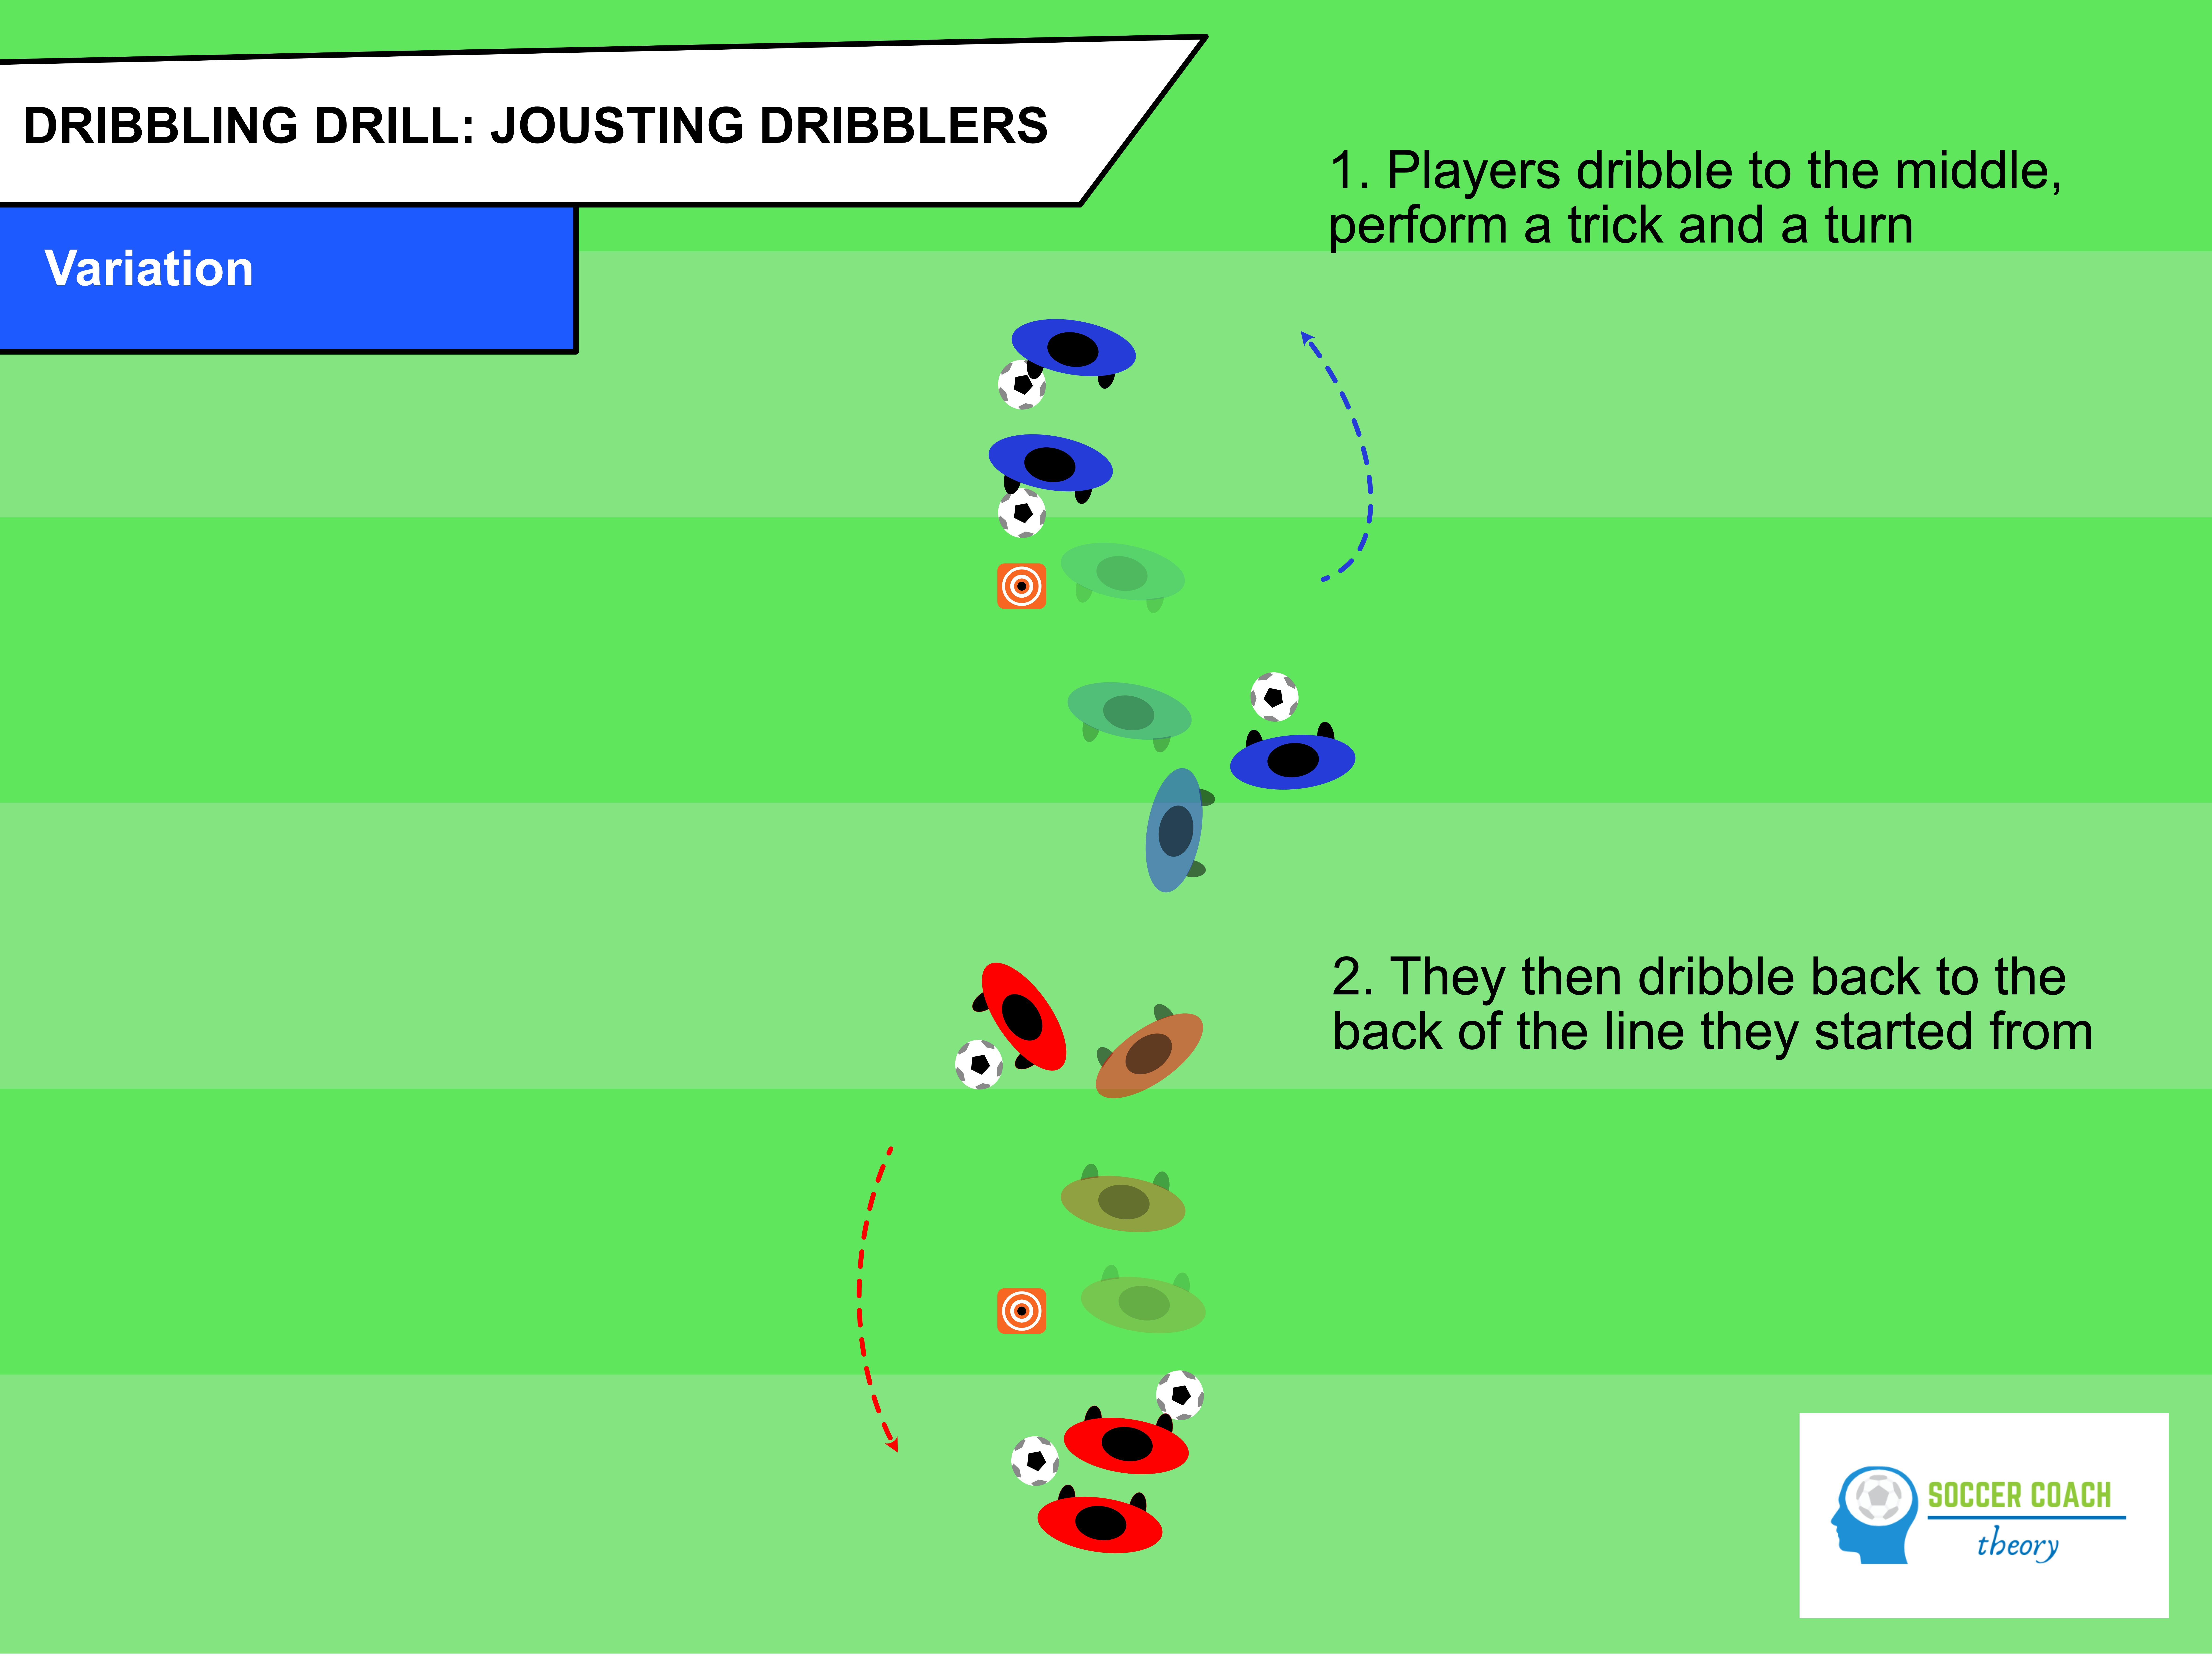 Soccer jousting dribblers - variation